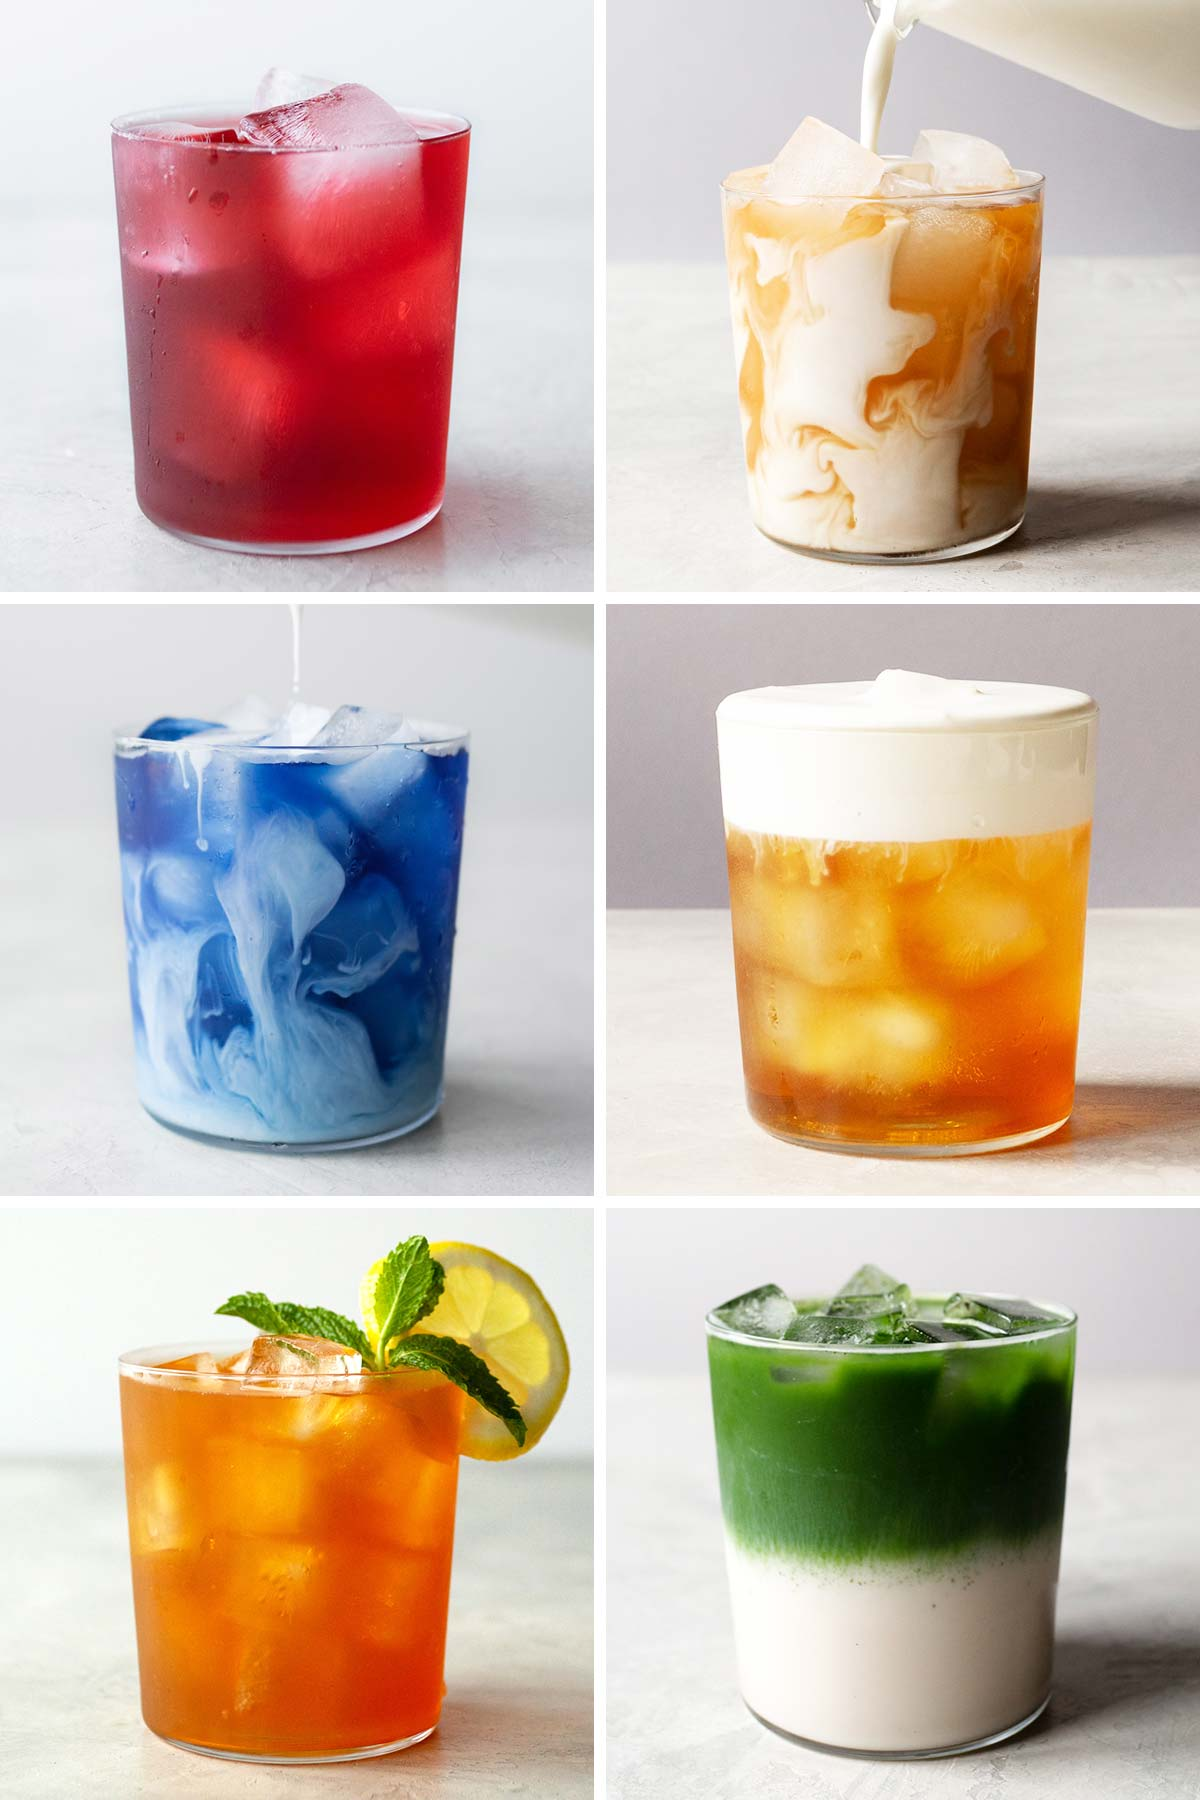 Seis collage de fotos de diferentes tés helados.